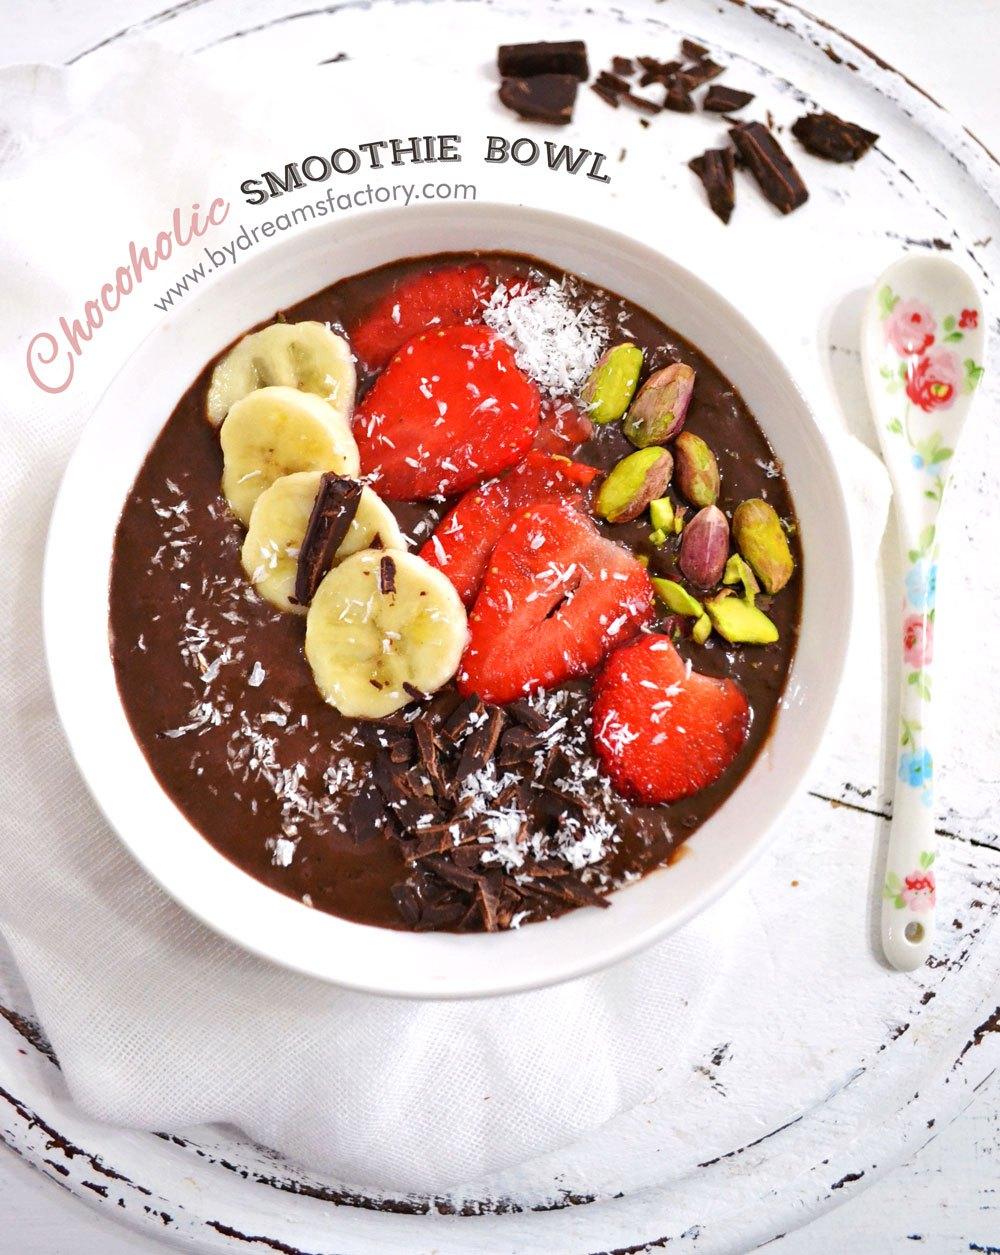 DSC_6162-smoothie-chochoholic-smoothie-bowl-final